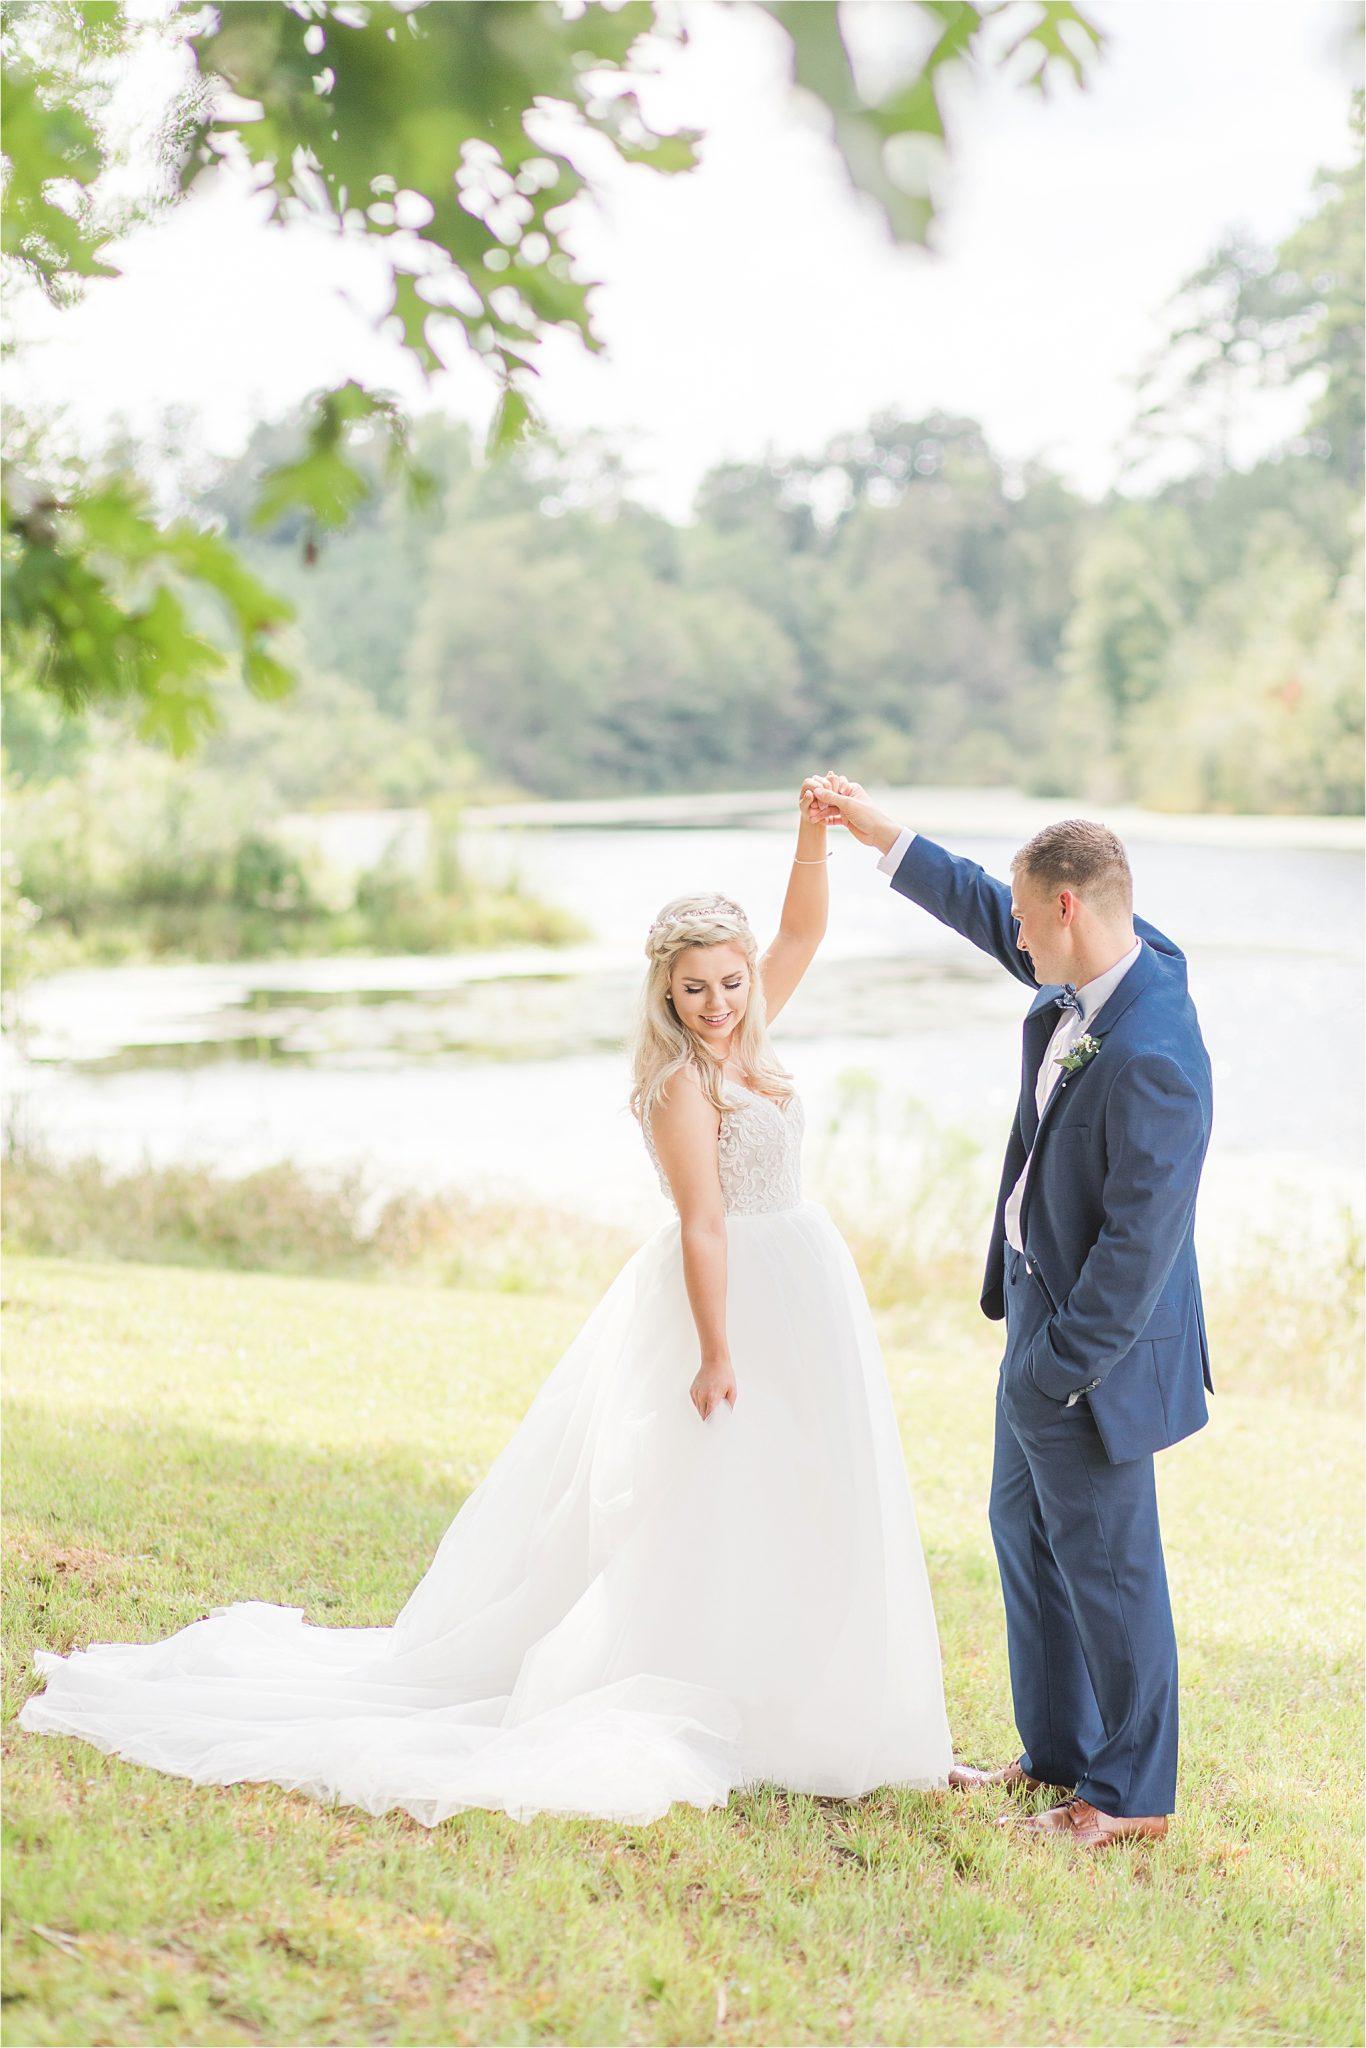 bridal-groom-portraits-photos-blue-suit-bow-tie-first-look-ideas